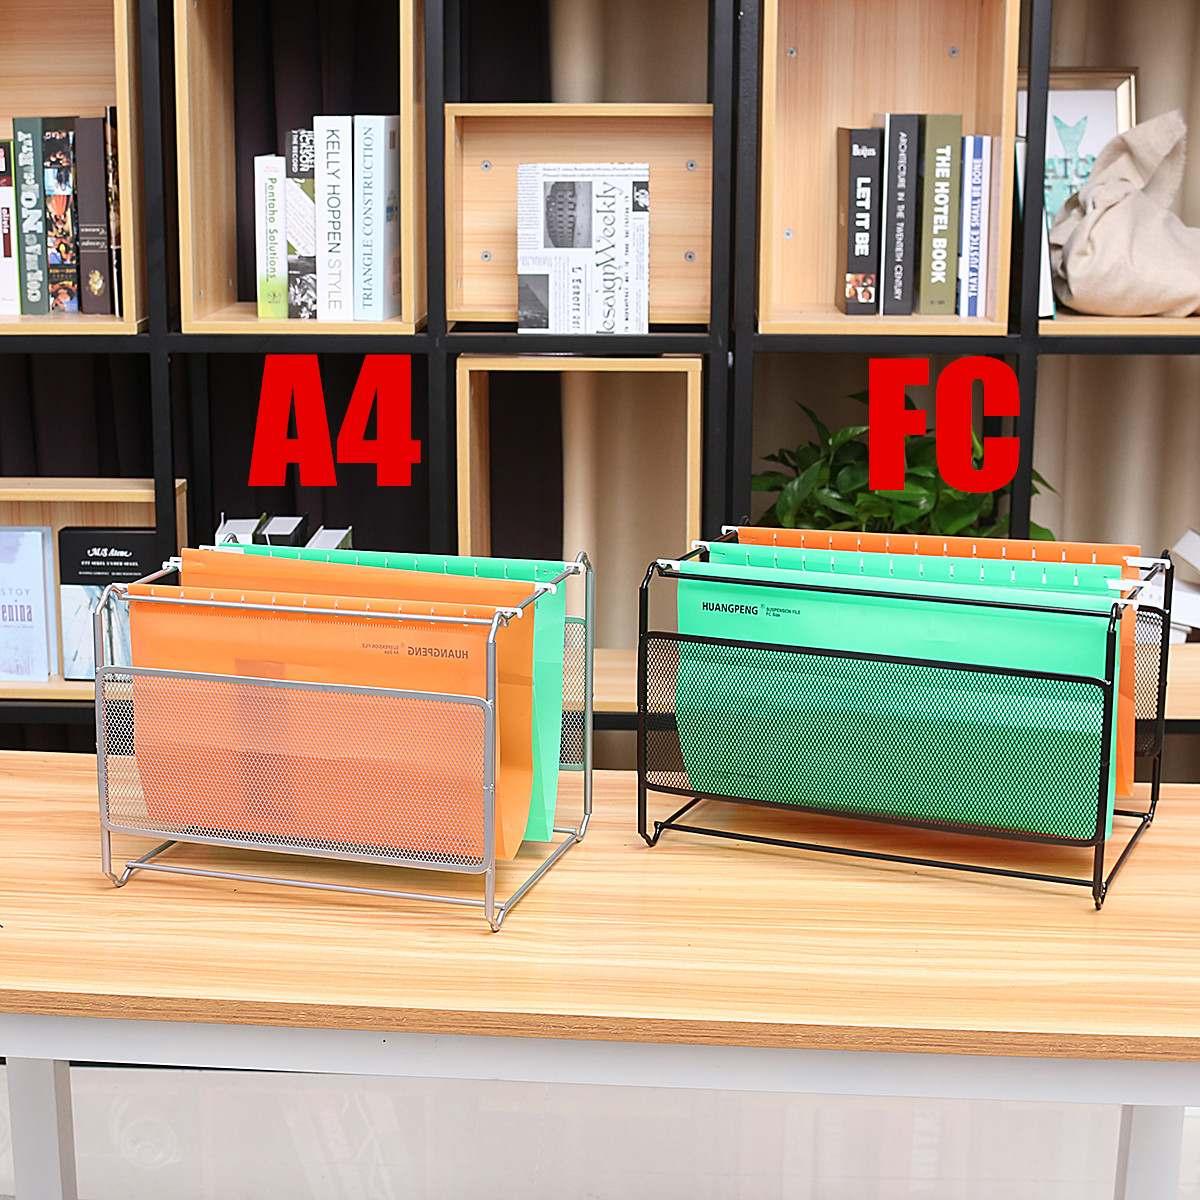 Magazine Holder Grid A4 File Bookshelf Wrought Iron Letter Storage Rack Tray Holder New Office Desk Organizer File Tray